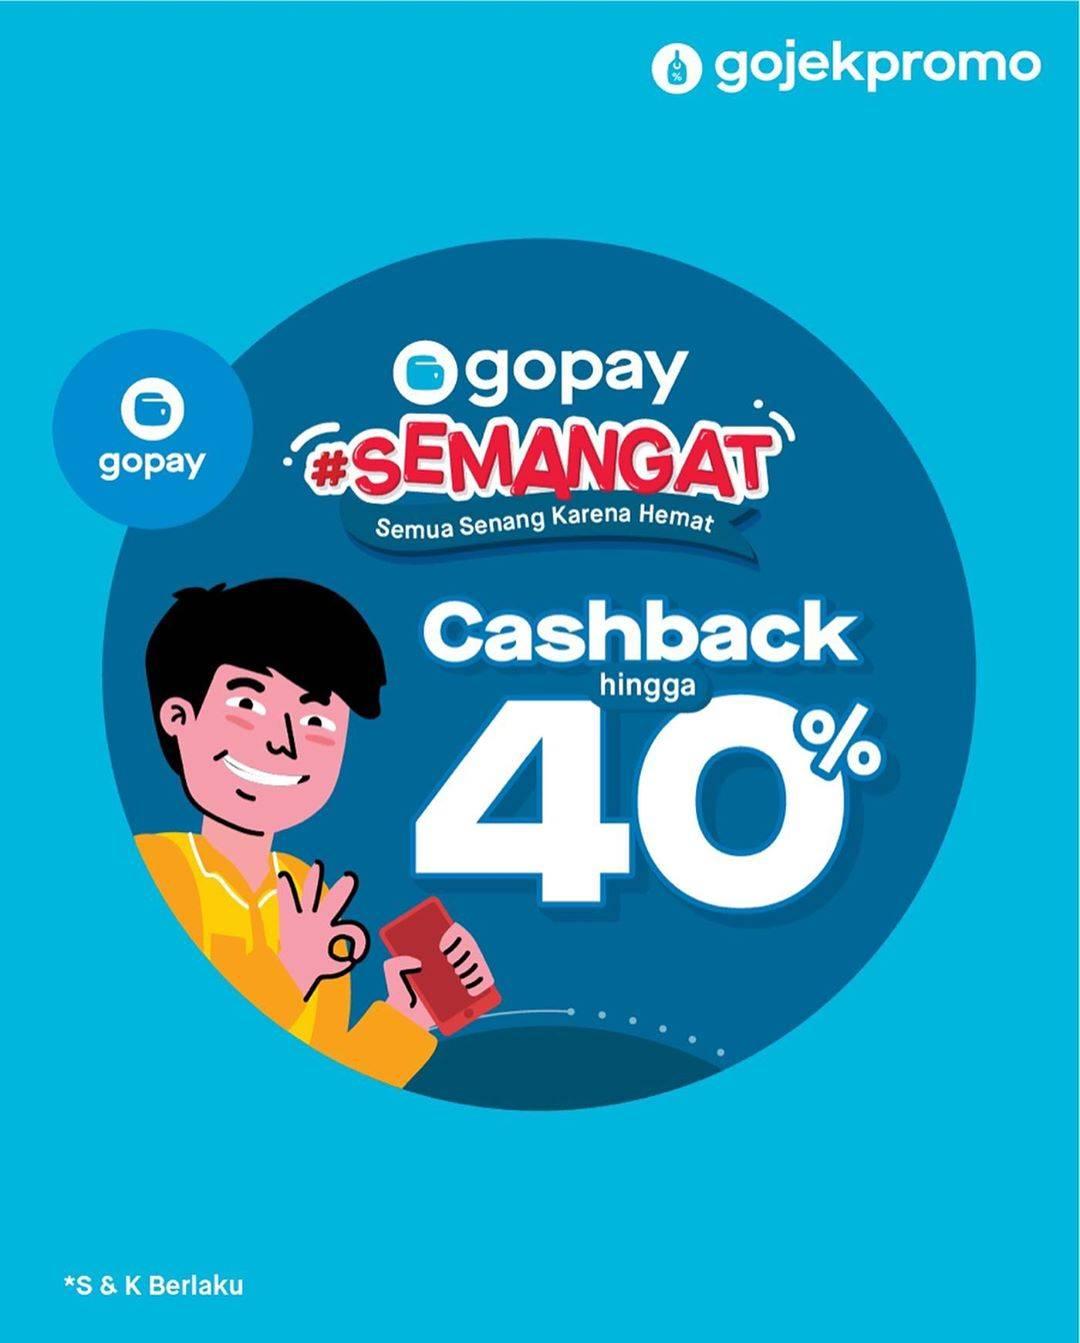 Gopay Cashback Hingga 40% - Promo Semangat Hari Ini November 2019